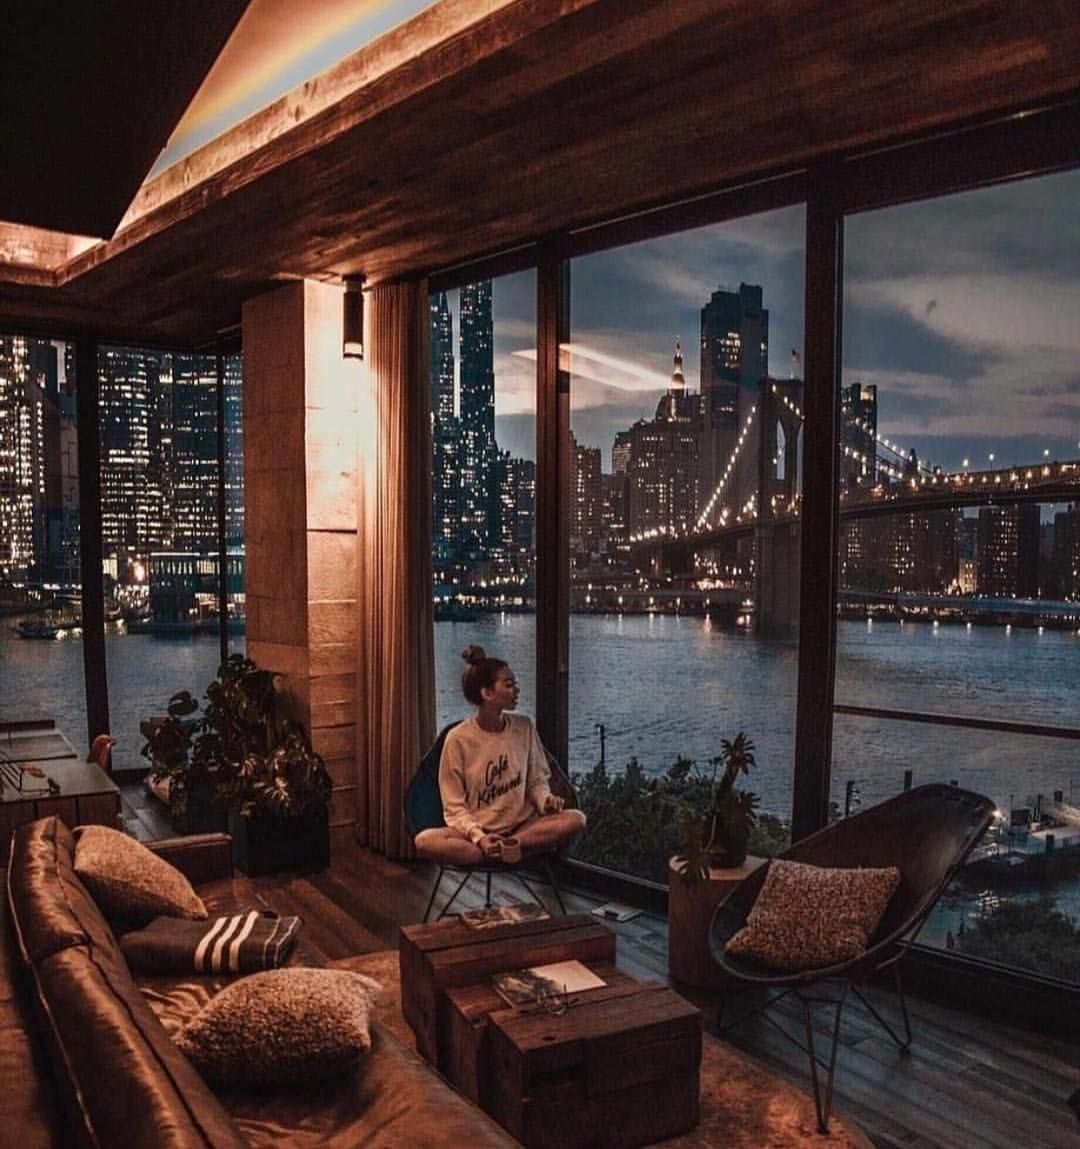 Cozy Night 😍 @taramilktea @love_mood_style